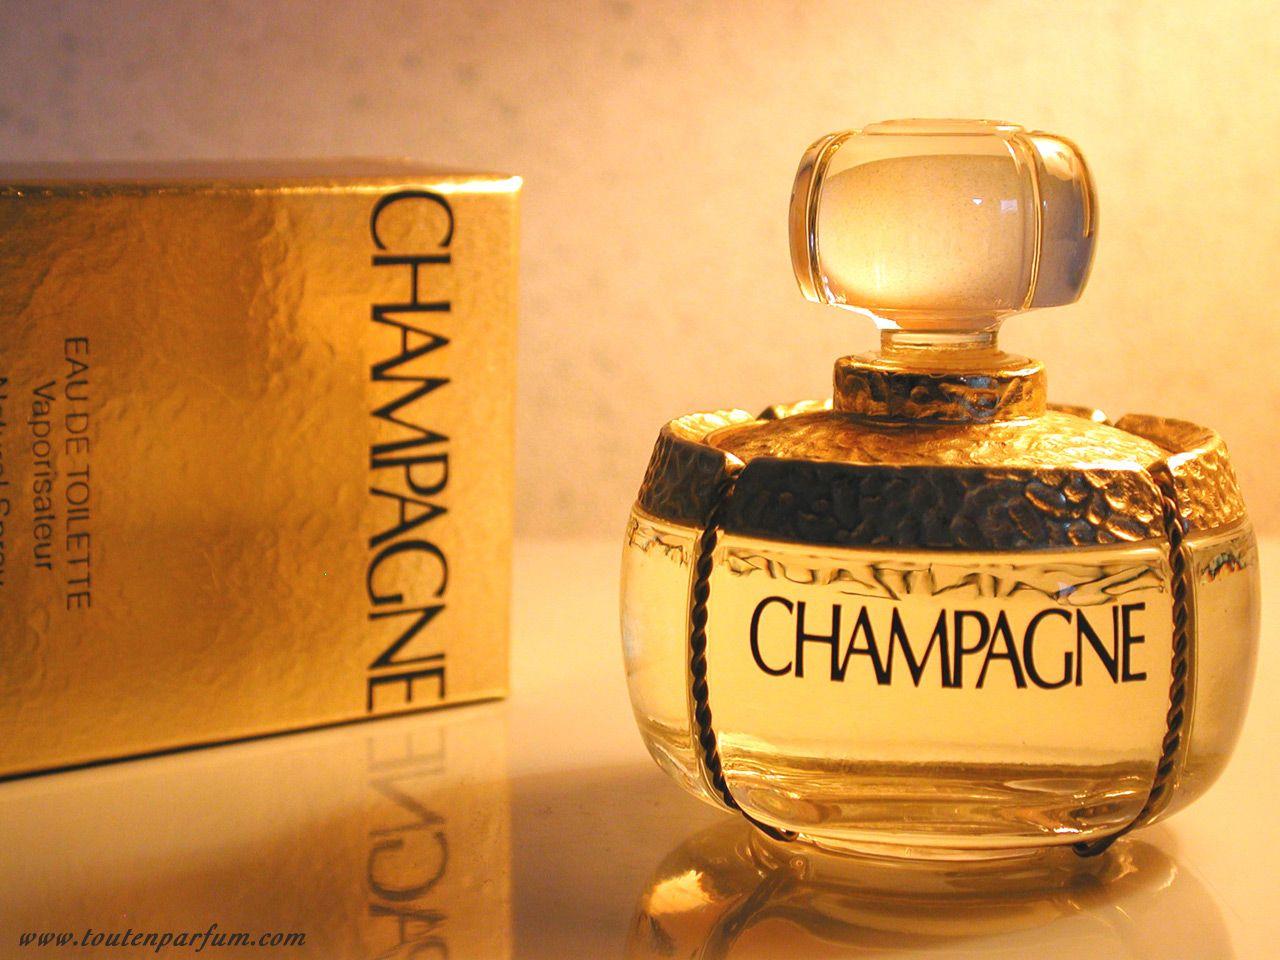 Yves ChampagneyvresseFragances Laurent Saint ParfumFlacons ChampagneyvresseFragances Yves Saint Laurent ParfumFlacons jGLMpqSUzV